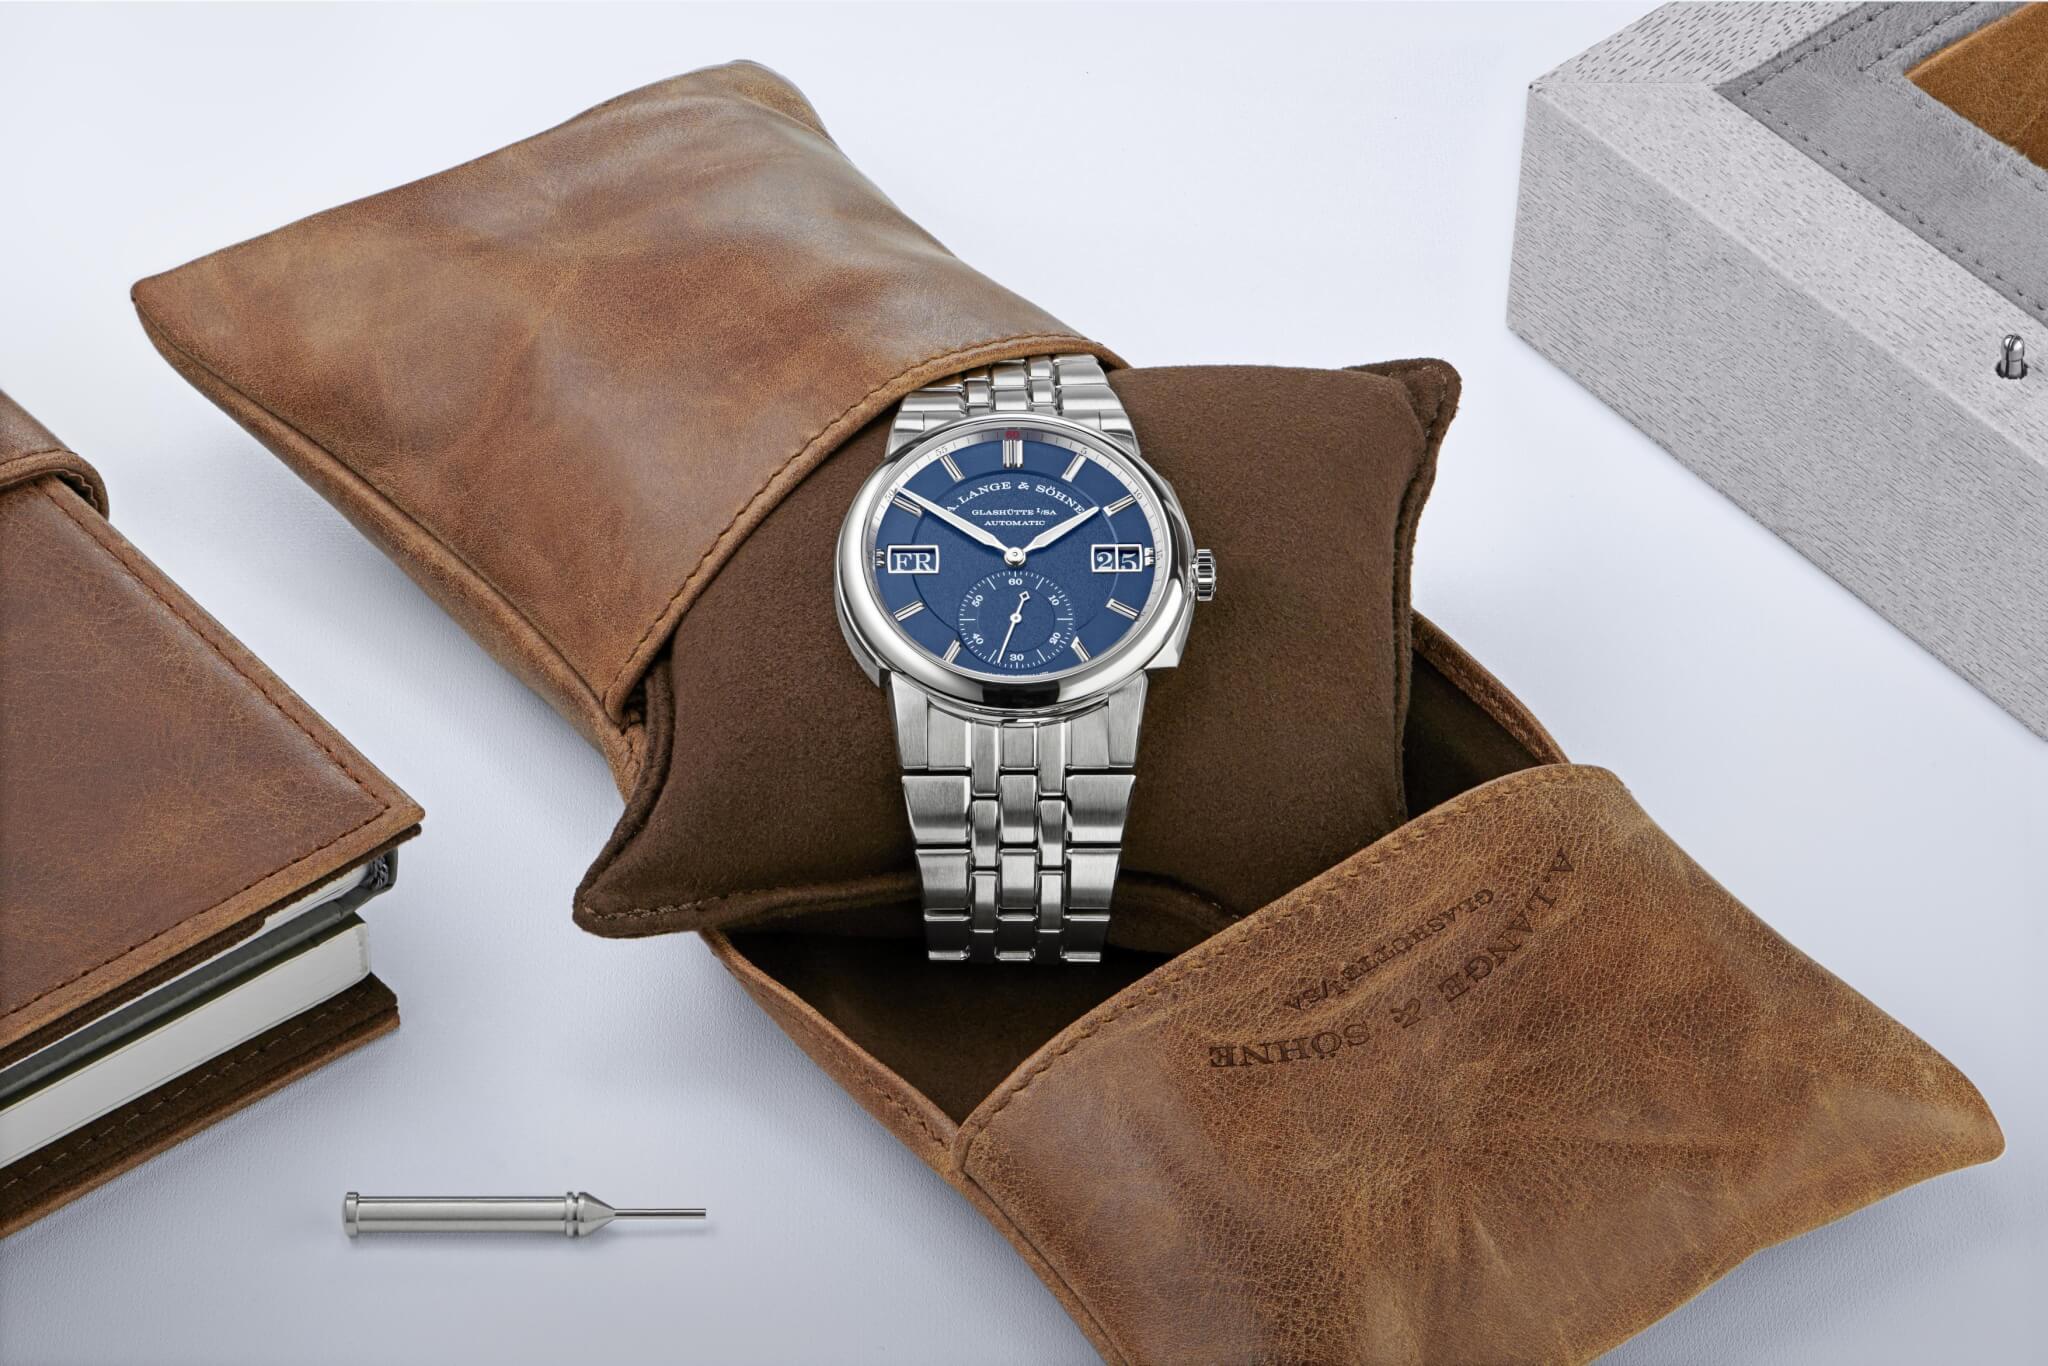 ODYSSEUS運動腕錶配精鋼錶帶